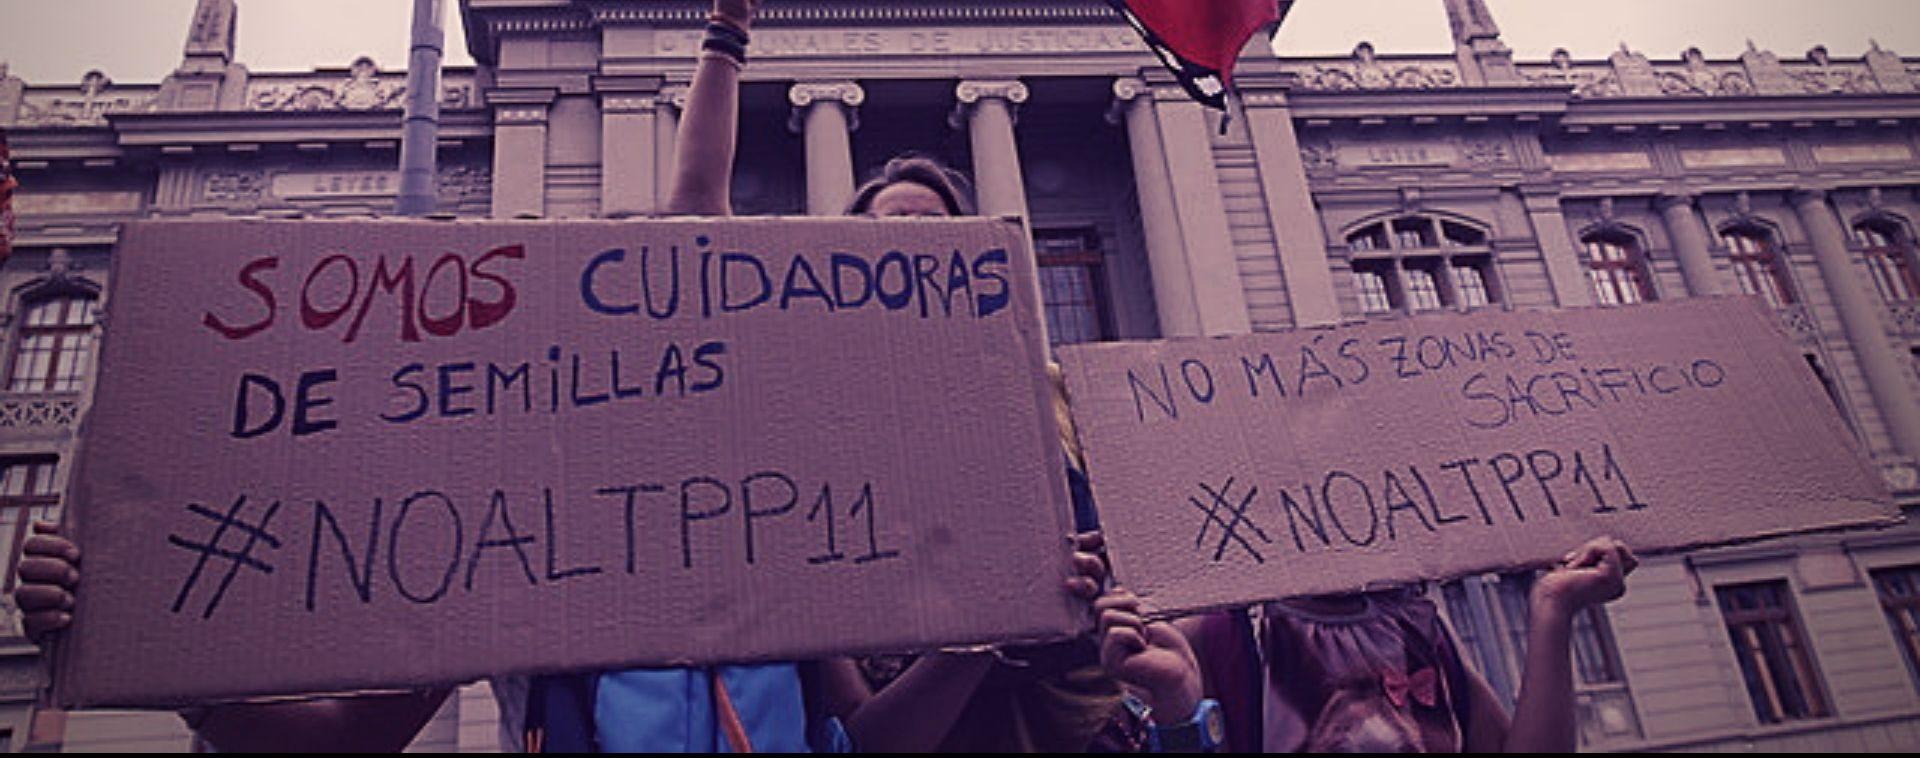 notpp tomate rojo agencia uno e1566789328117 288x180 - Piñera le pone suma urgencia al TPP 11 por cuarta vez y espera que se apruebe antes de fin de mes